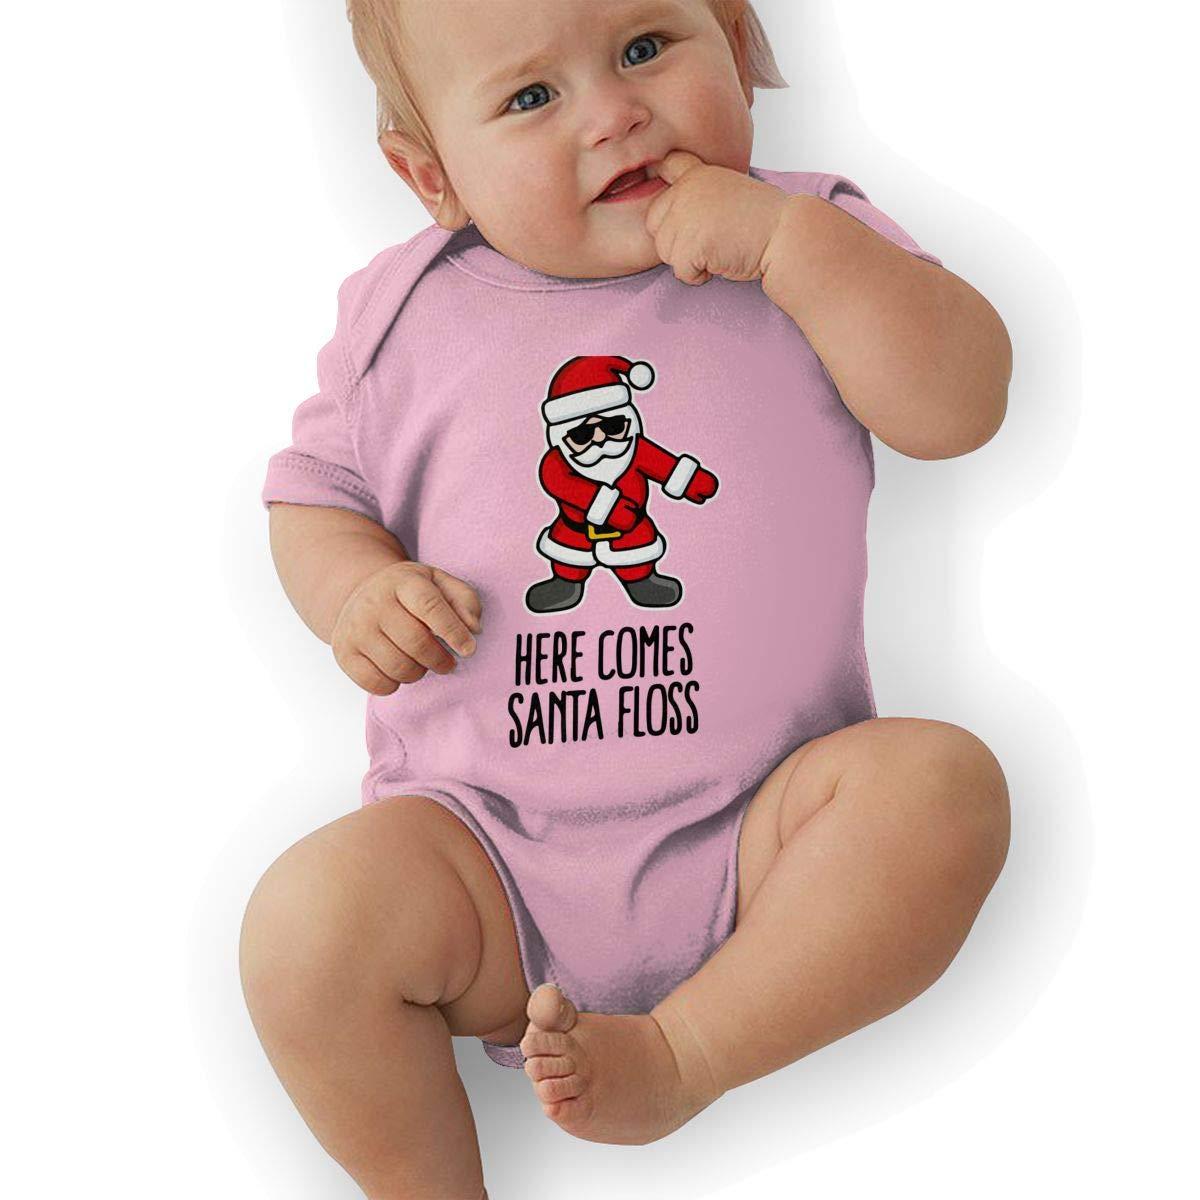 BONLOR Santa Floss Dance Baby Boys Girls Jumpsuit Overall Romper Bodysuit Summer Clothes Pink